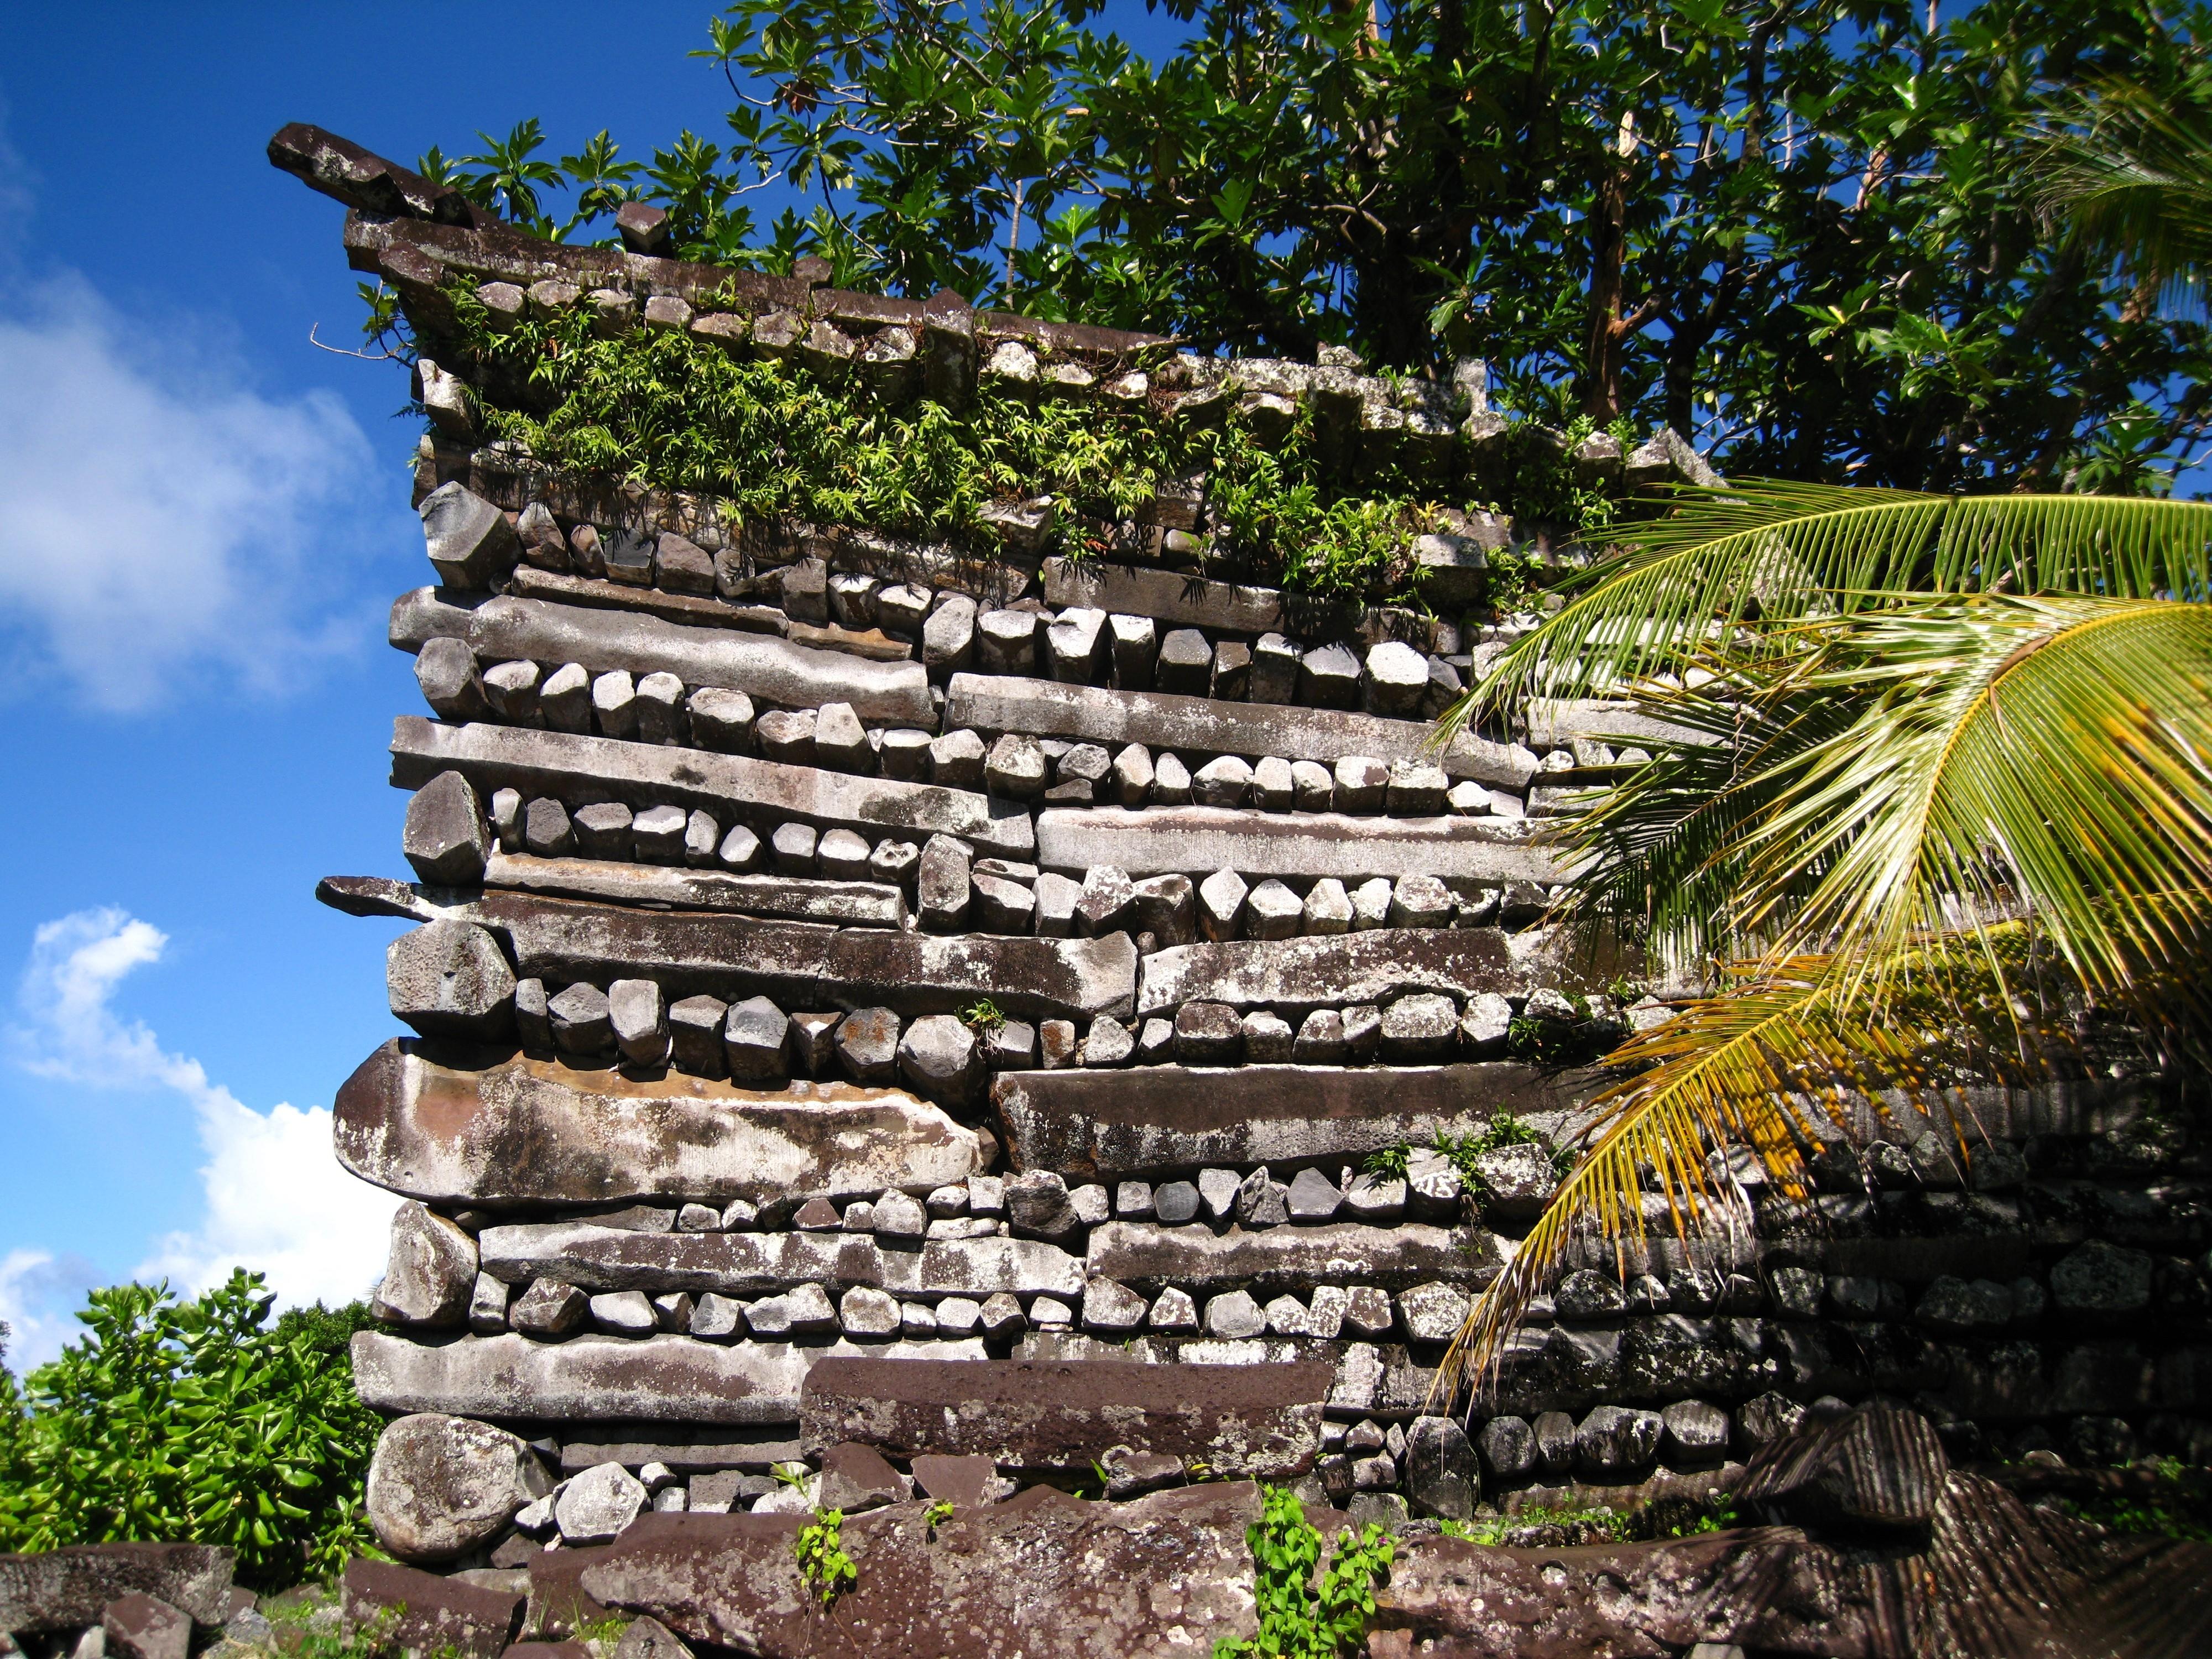 Le Centre cérémoniel Nan Madol en Micronésie ©Takuya Nagaka